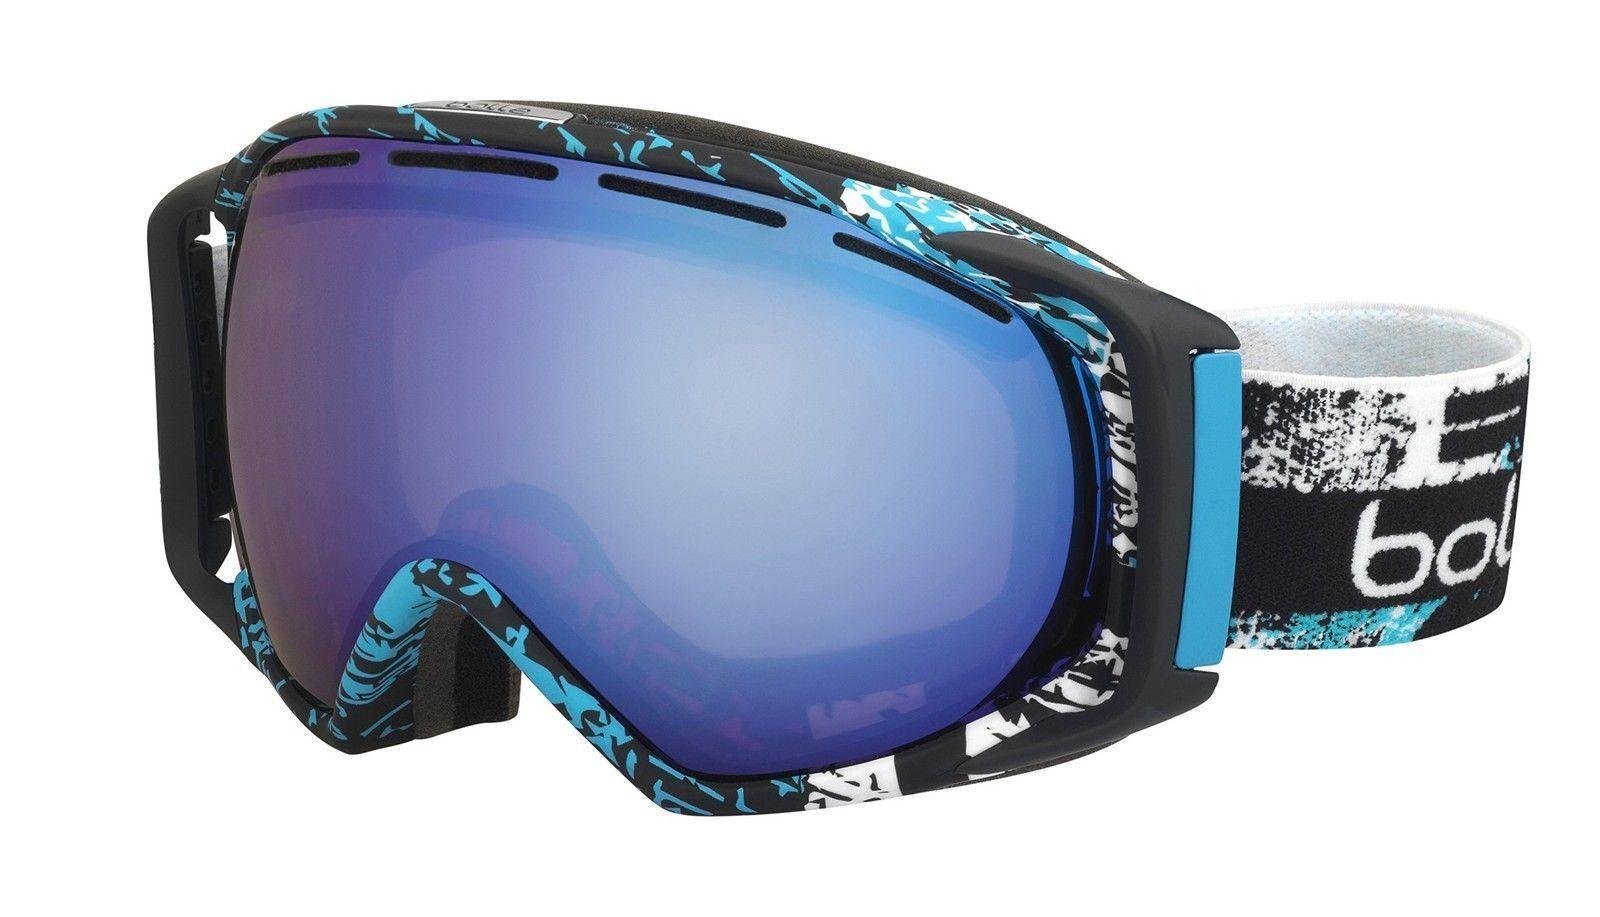 Bolle Gravity Ski Goggles Snowboarding Cat 2 bluee Lens 21295